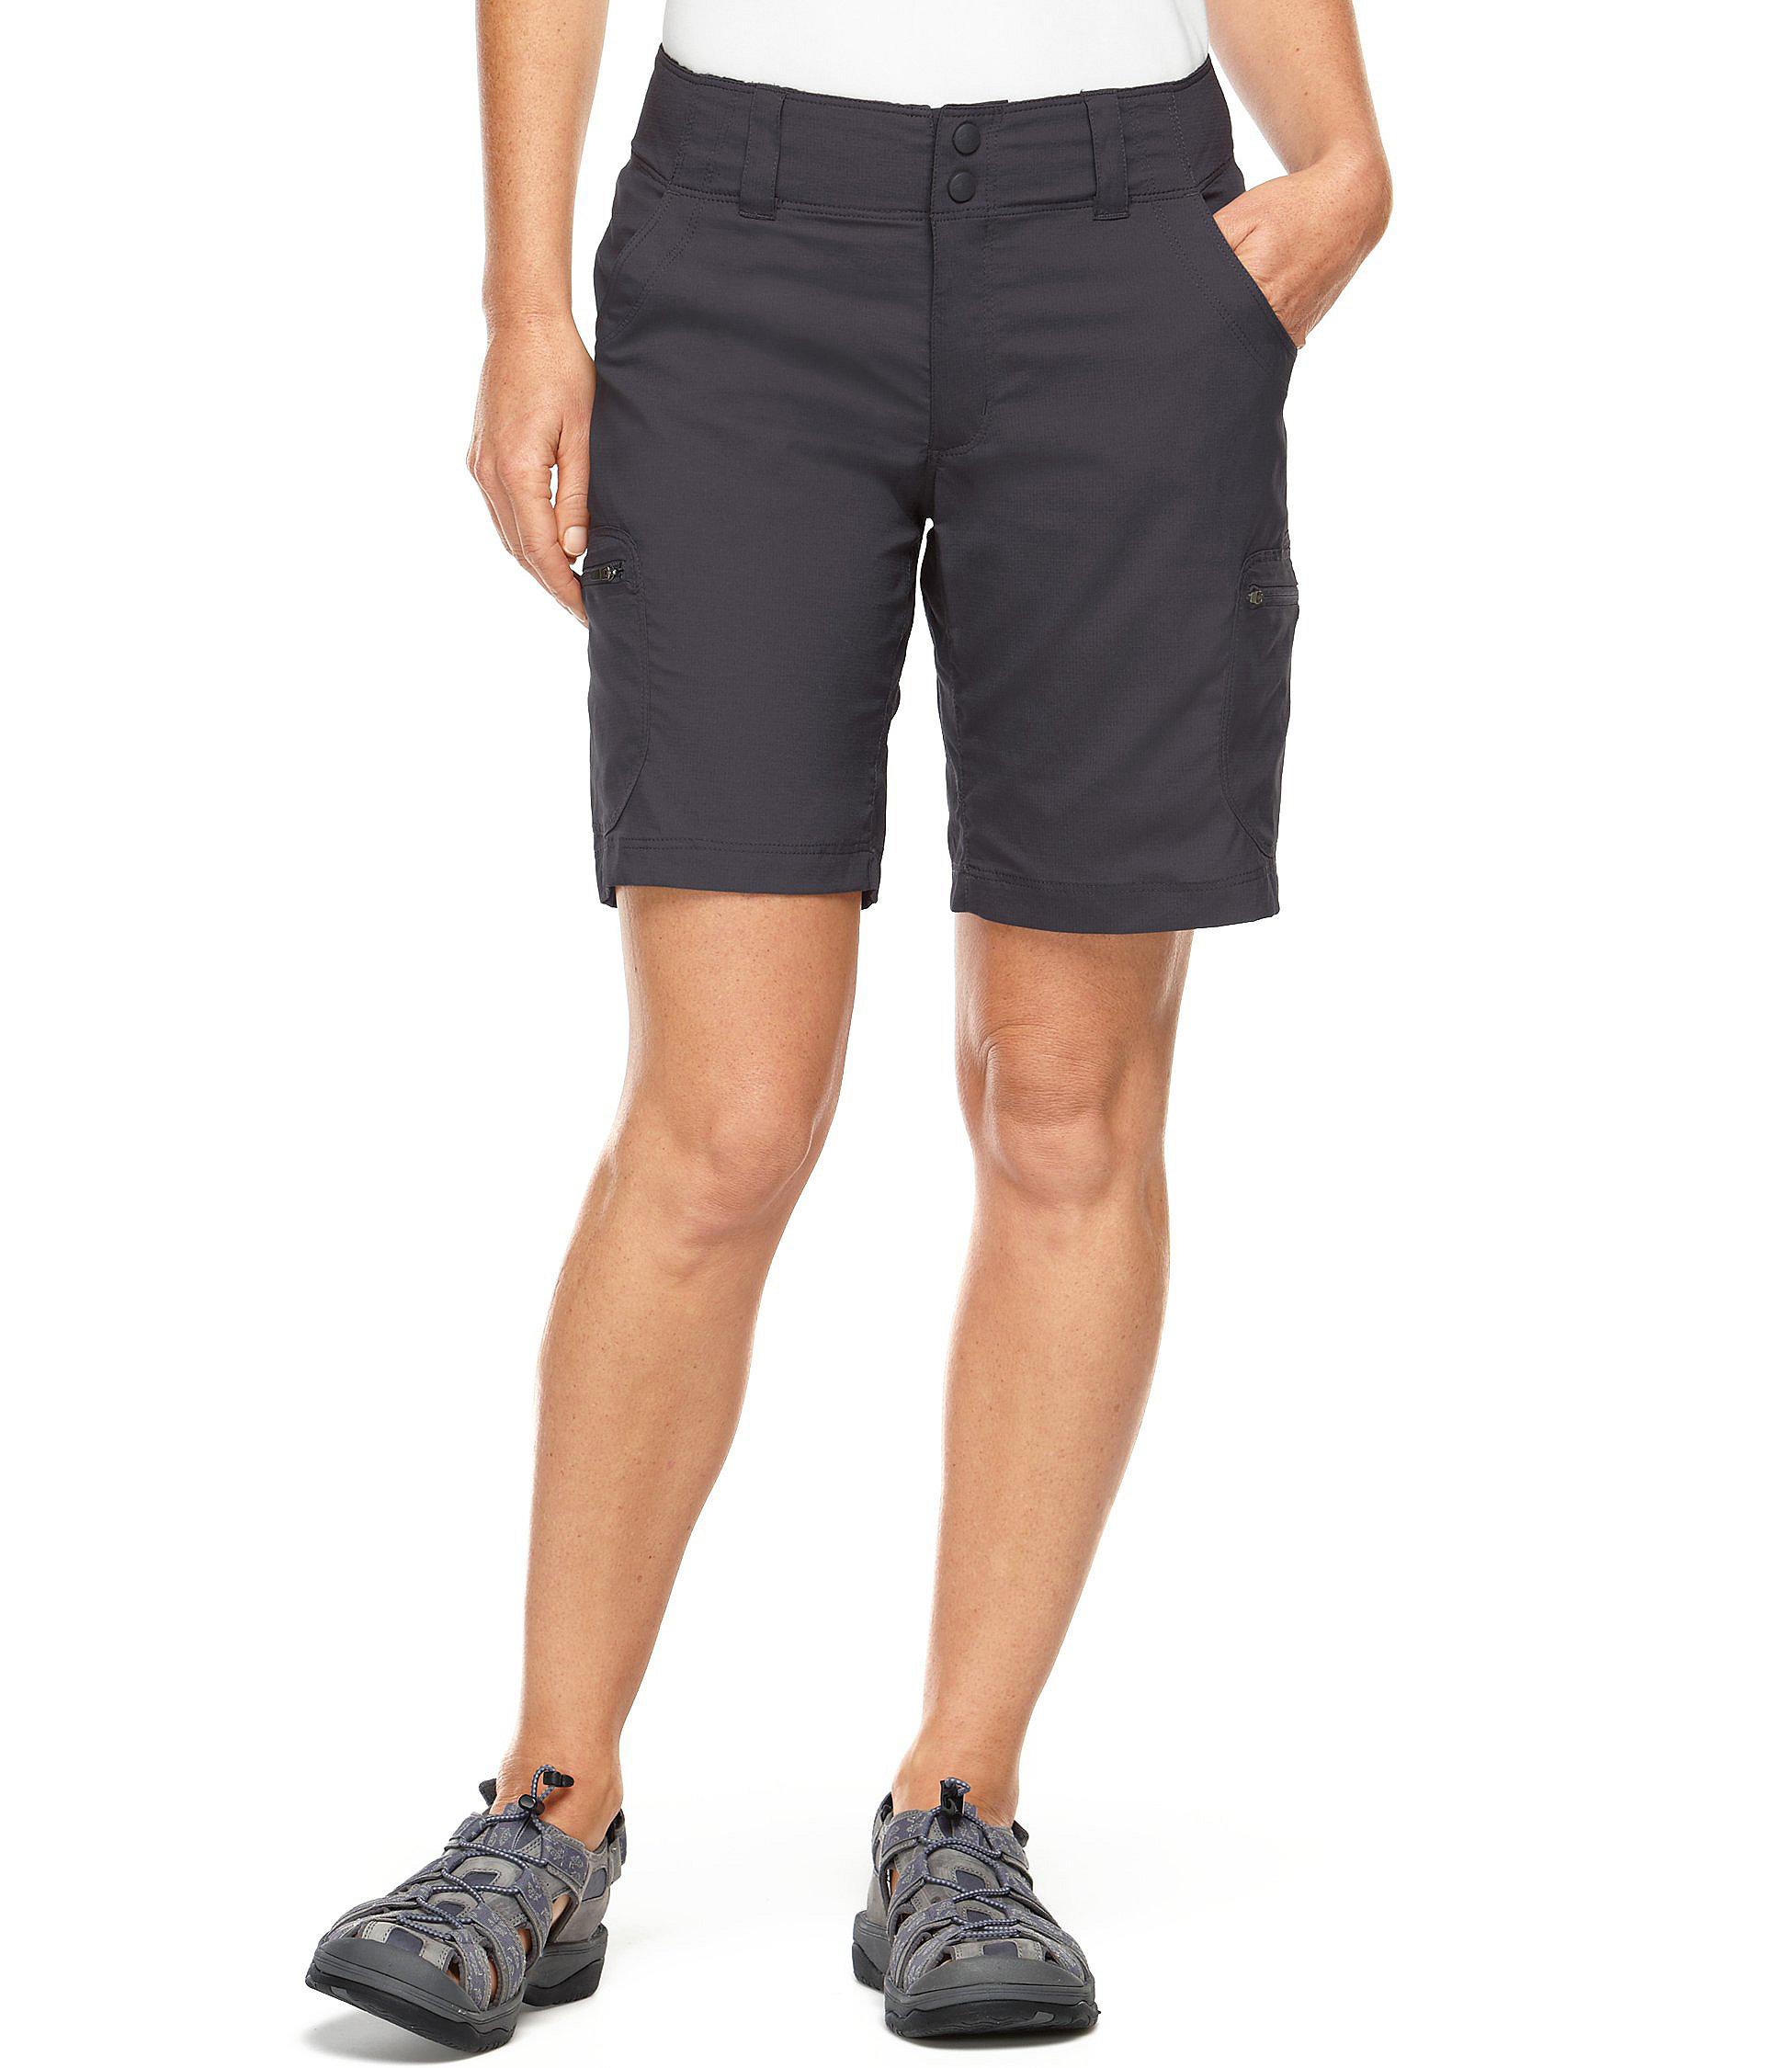 Women's Shorts Skorts | Free Shipping at L.L.Bean